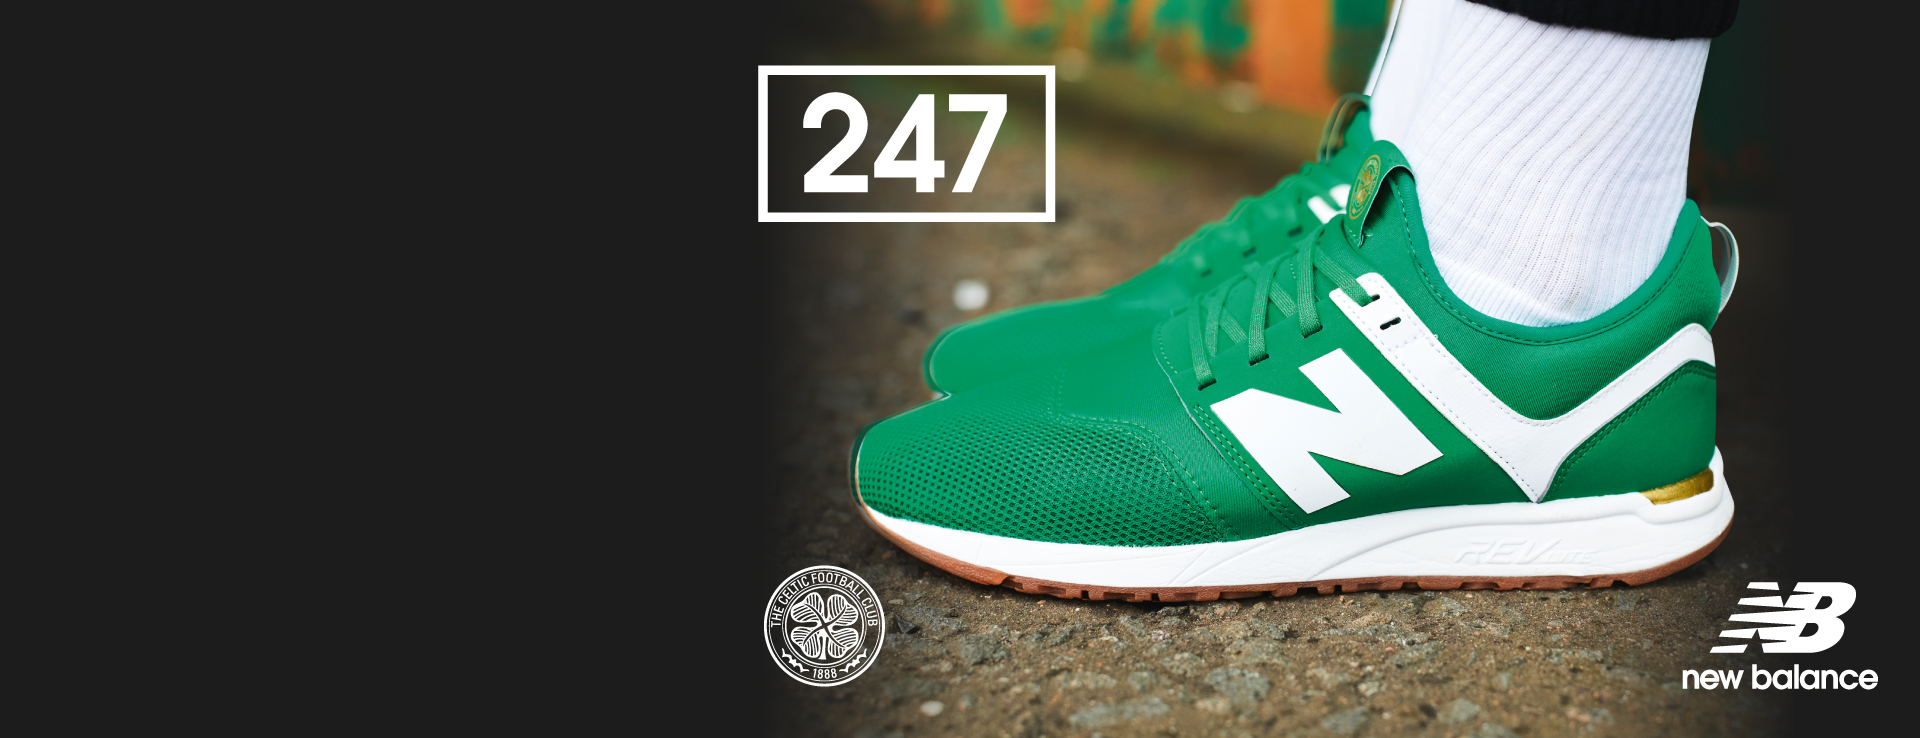 Celtic FC New Balance 247 Trainer